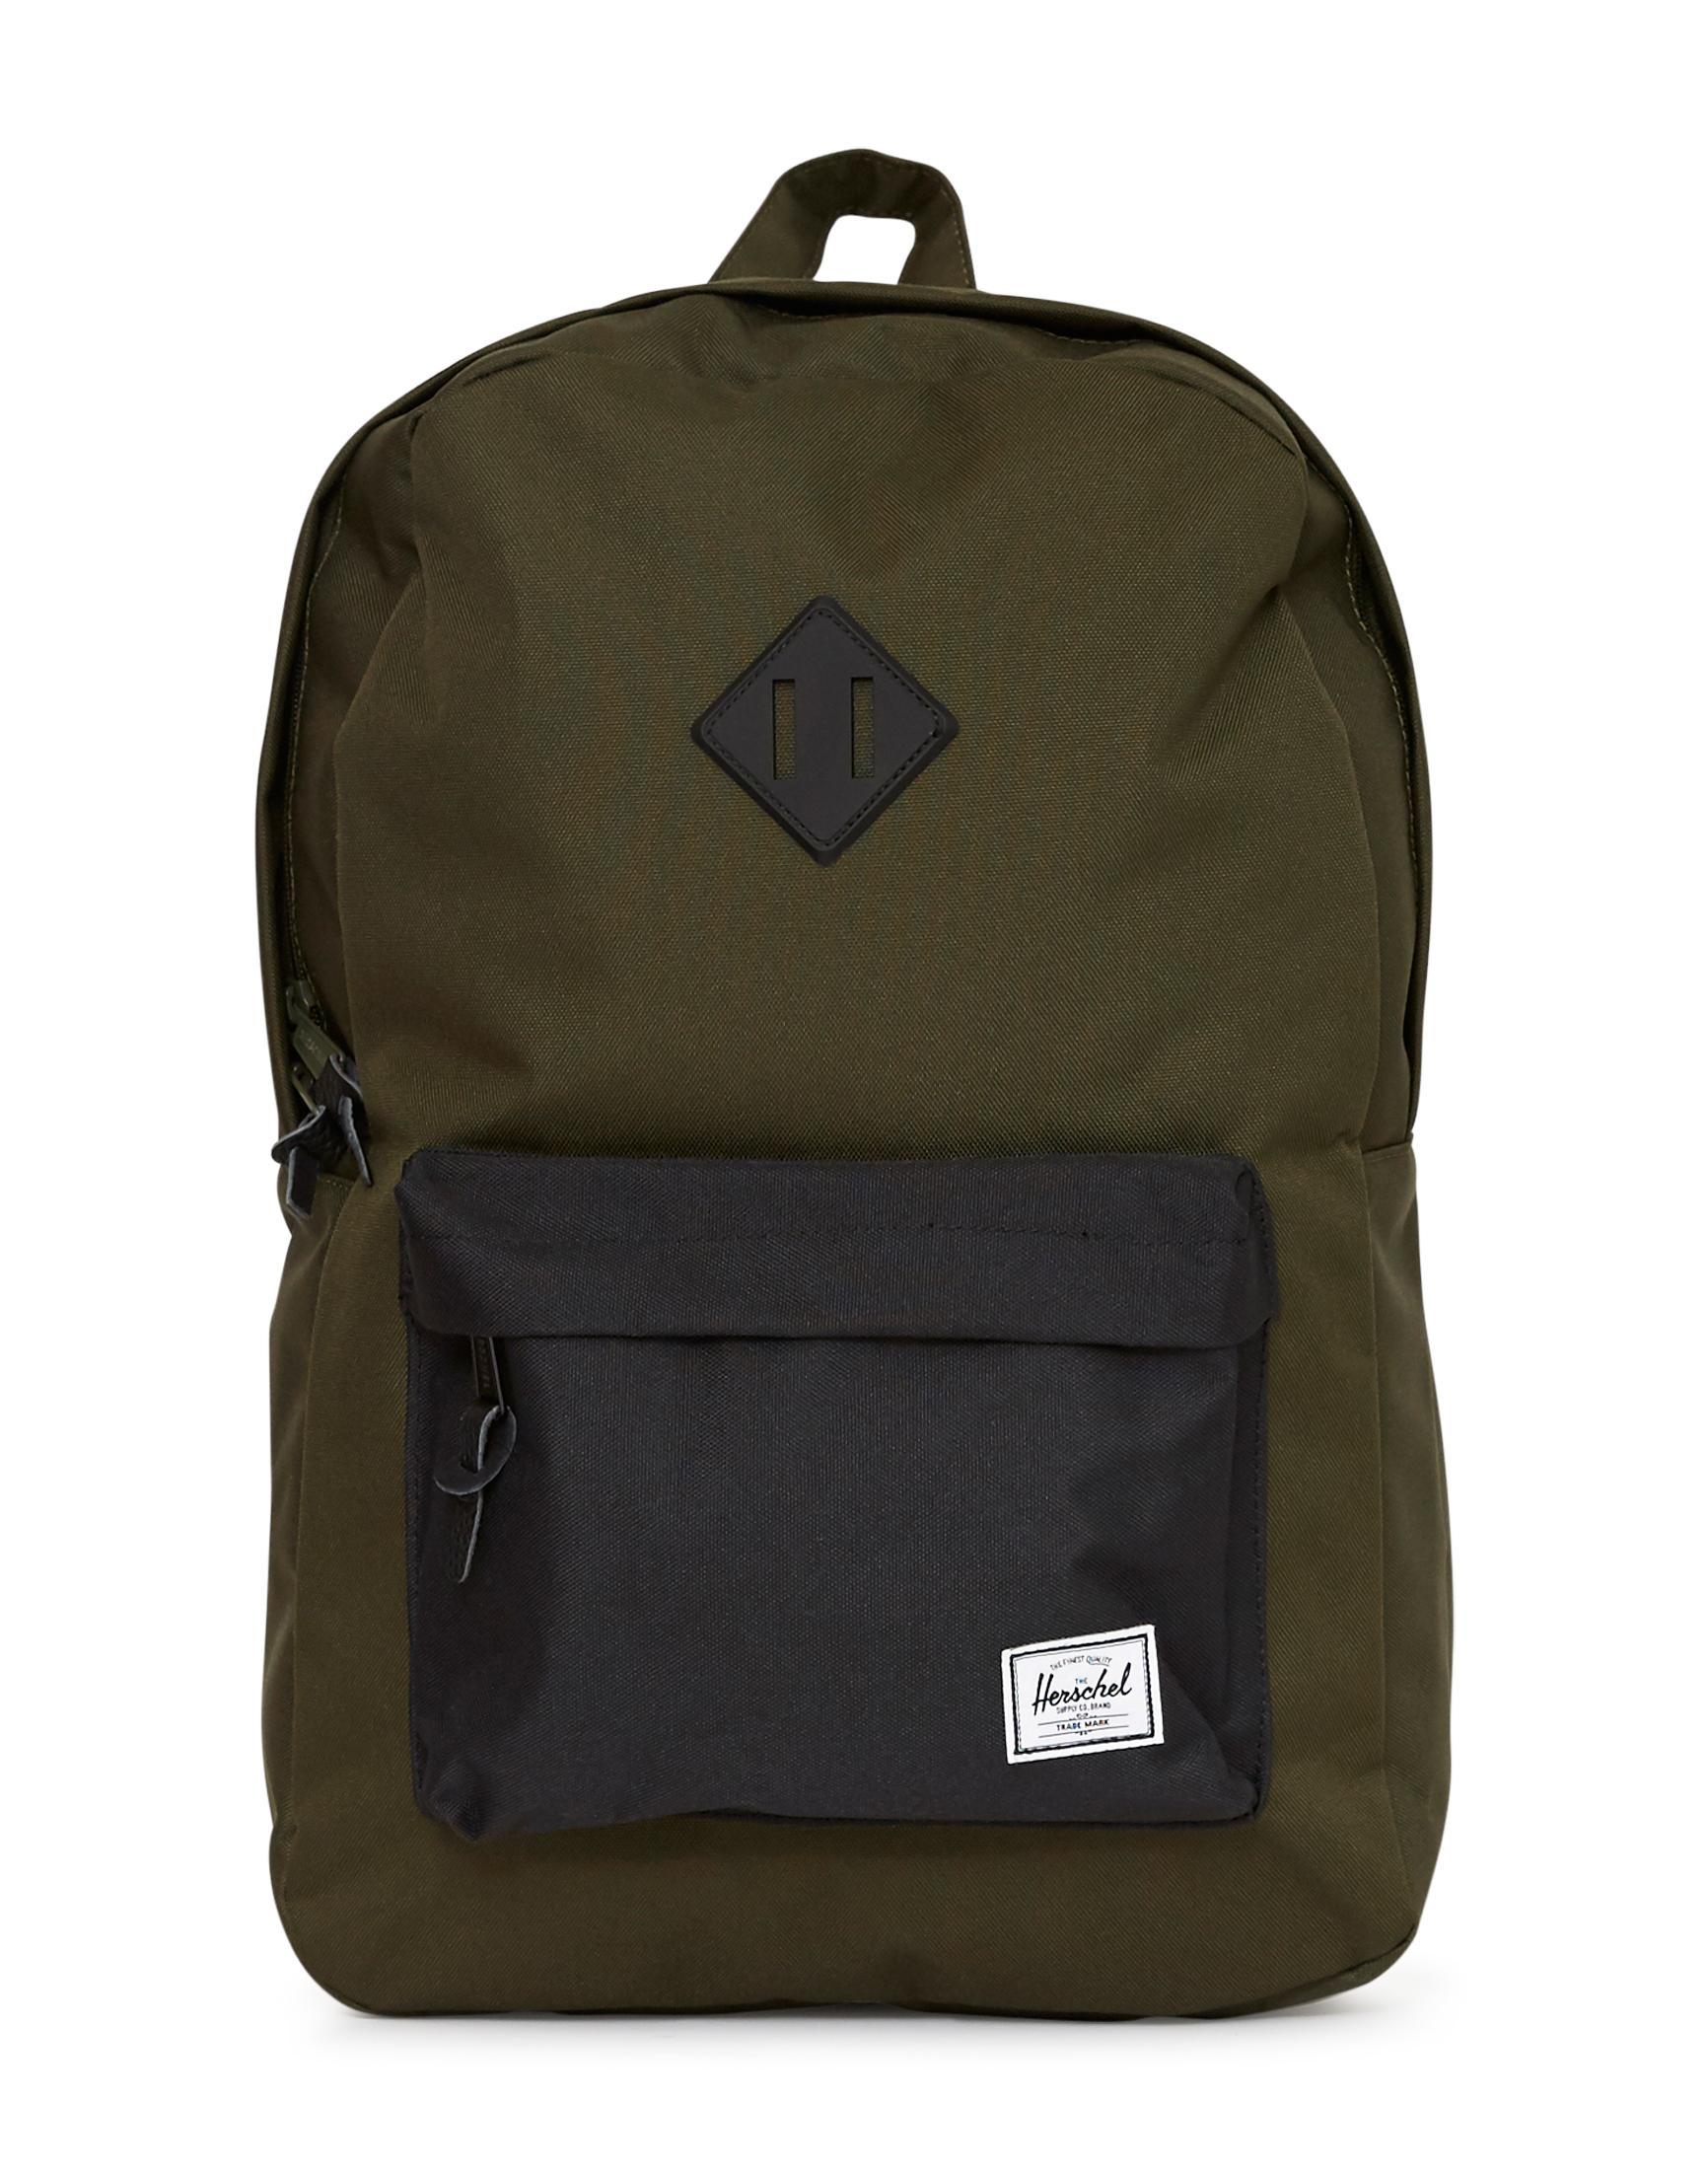 1a4c5cd6f511 Herschel Backpack Travel Club